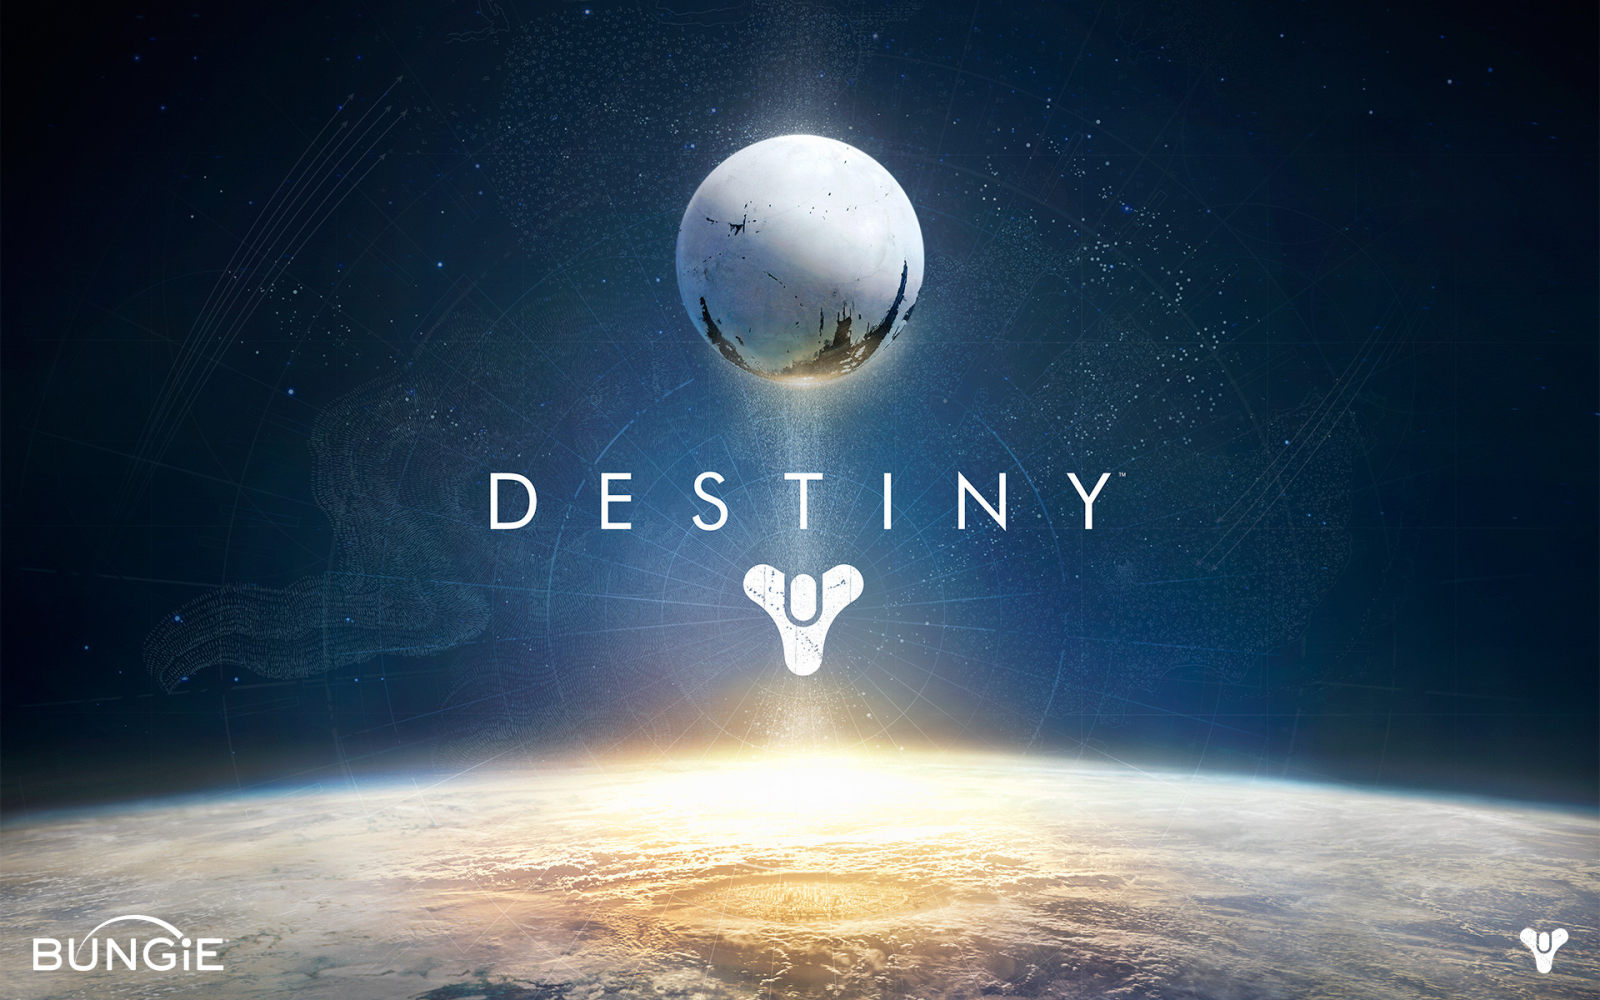 【Destiny】最新视频